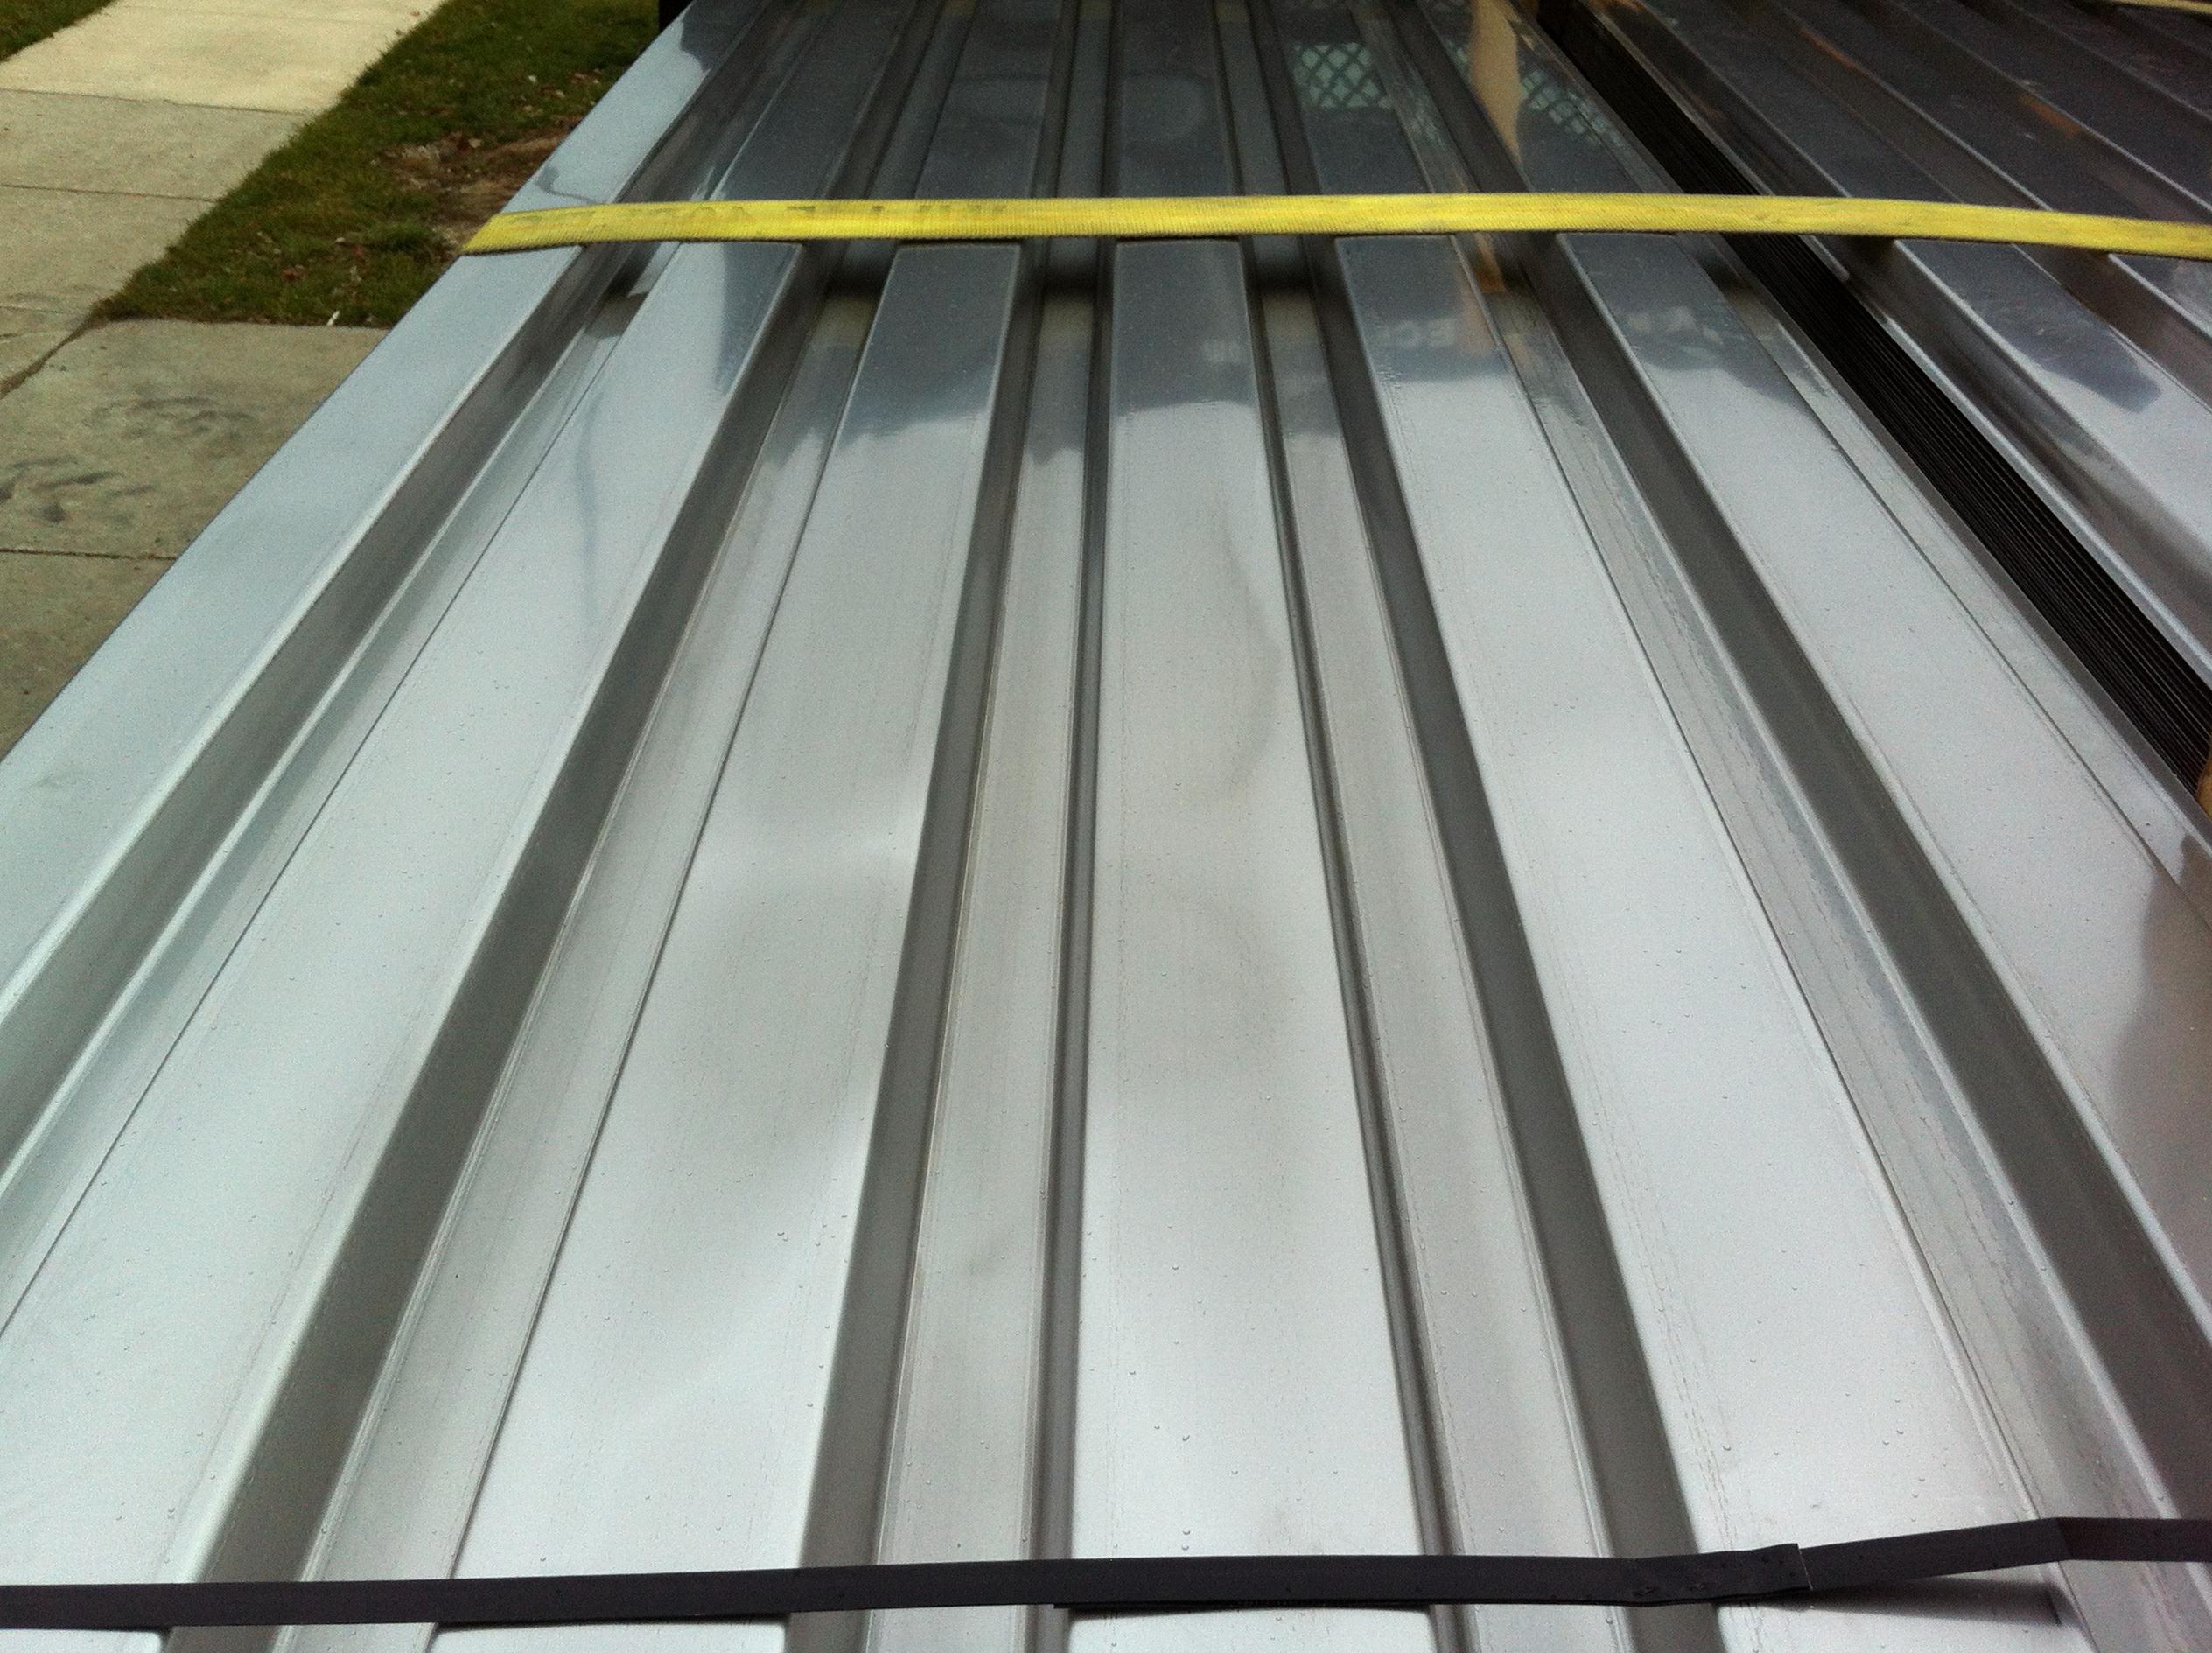 Metal Roof Decking Details